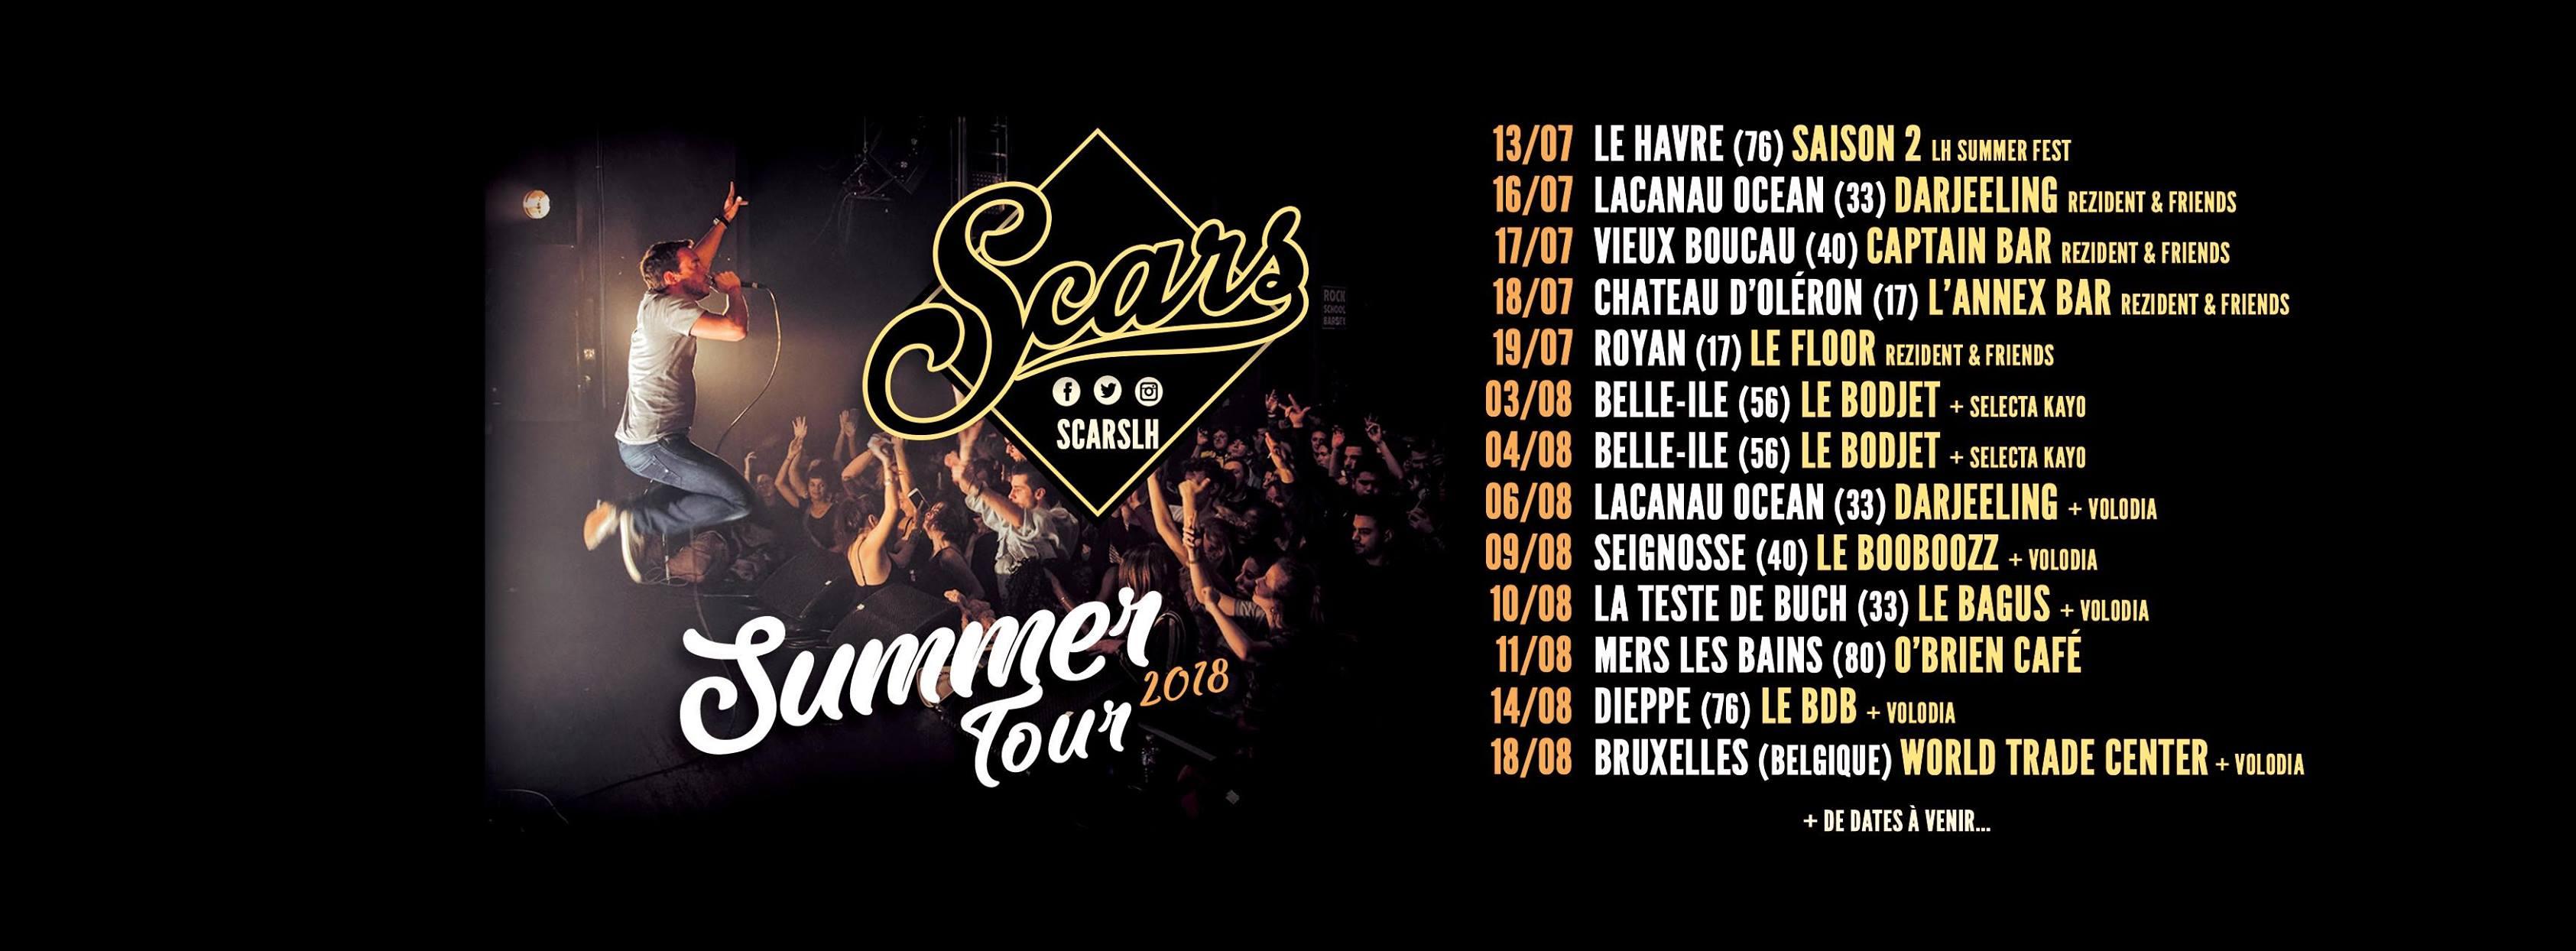 Summer Tour Scars Selecta Antwan